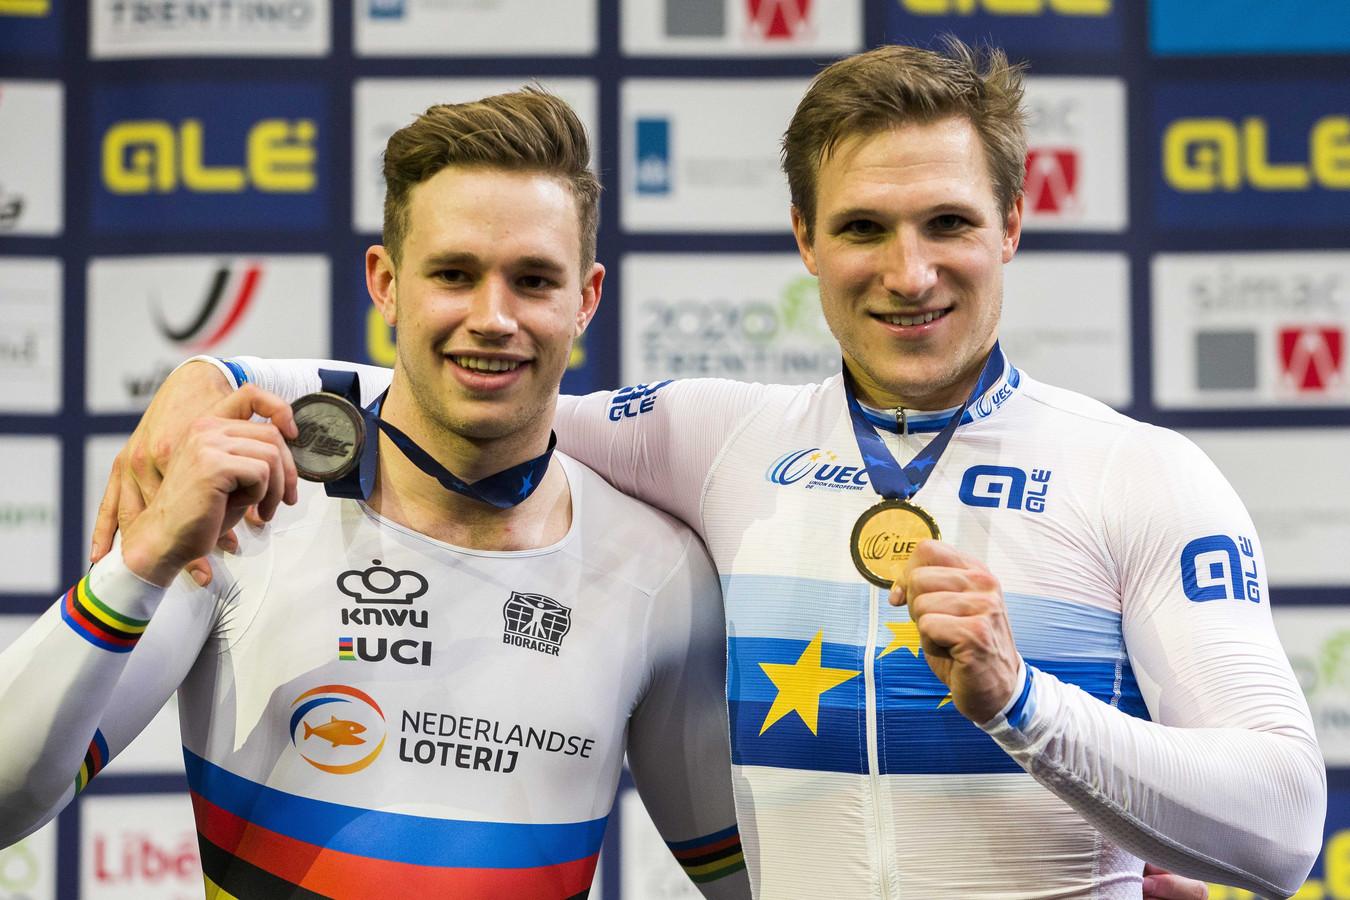 Kersvers Europees kampioen Jeffrey Hoogland (rechts) en Harrie Lavreysen (links) poseren met hun EK-medailles.